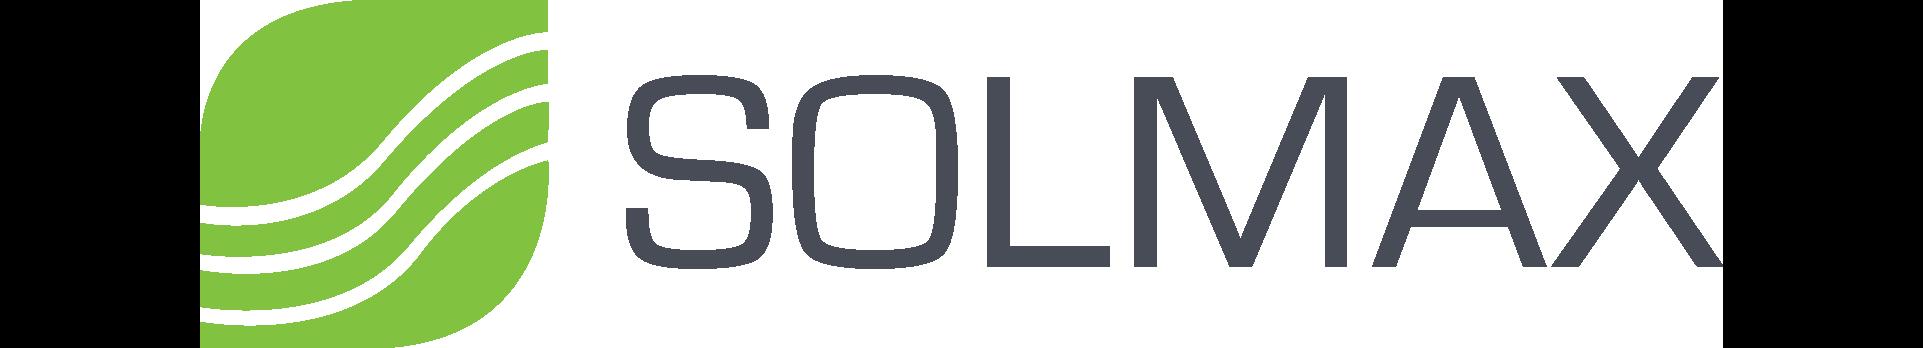 logo_Solmax_horizontal